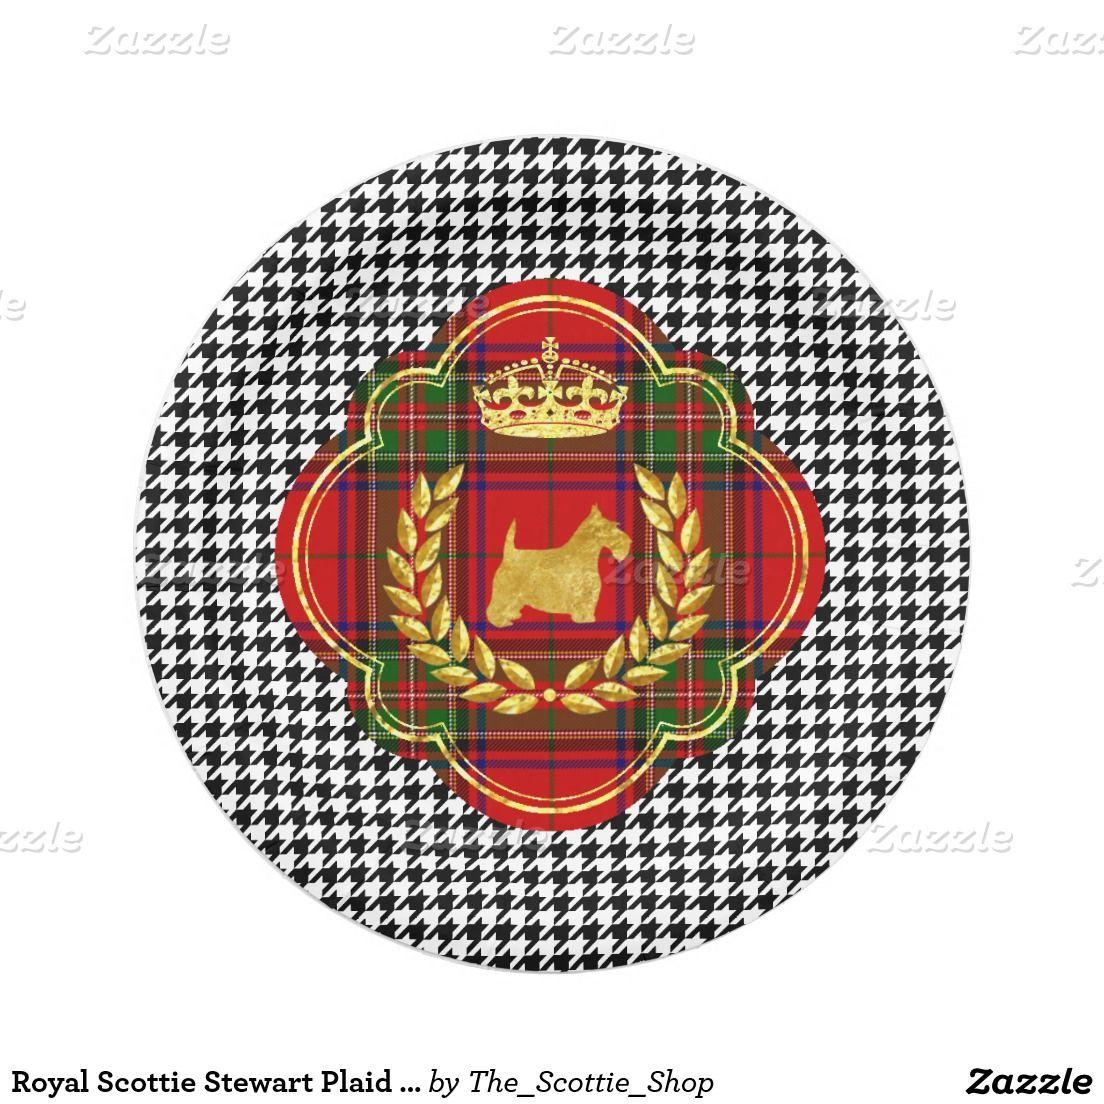 Royal Scottie Stewart Plaid Houndstooth 7 Inch Paper Plate